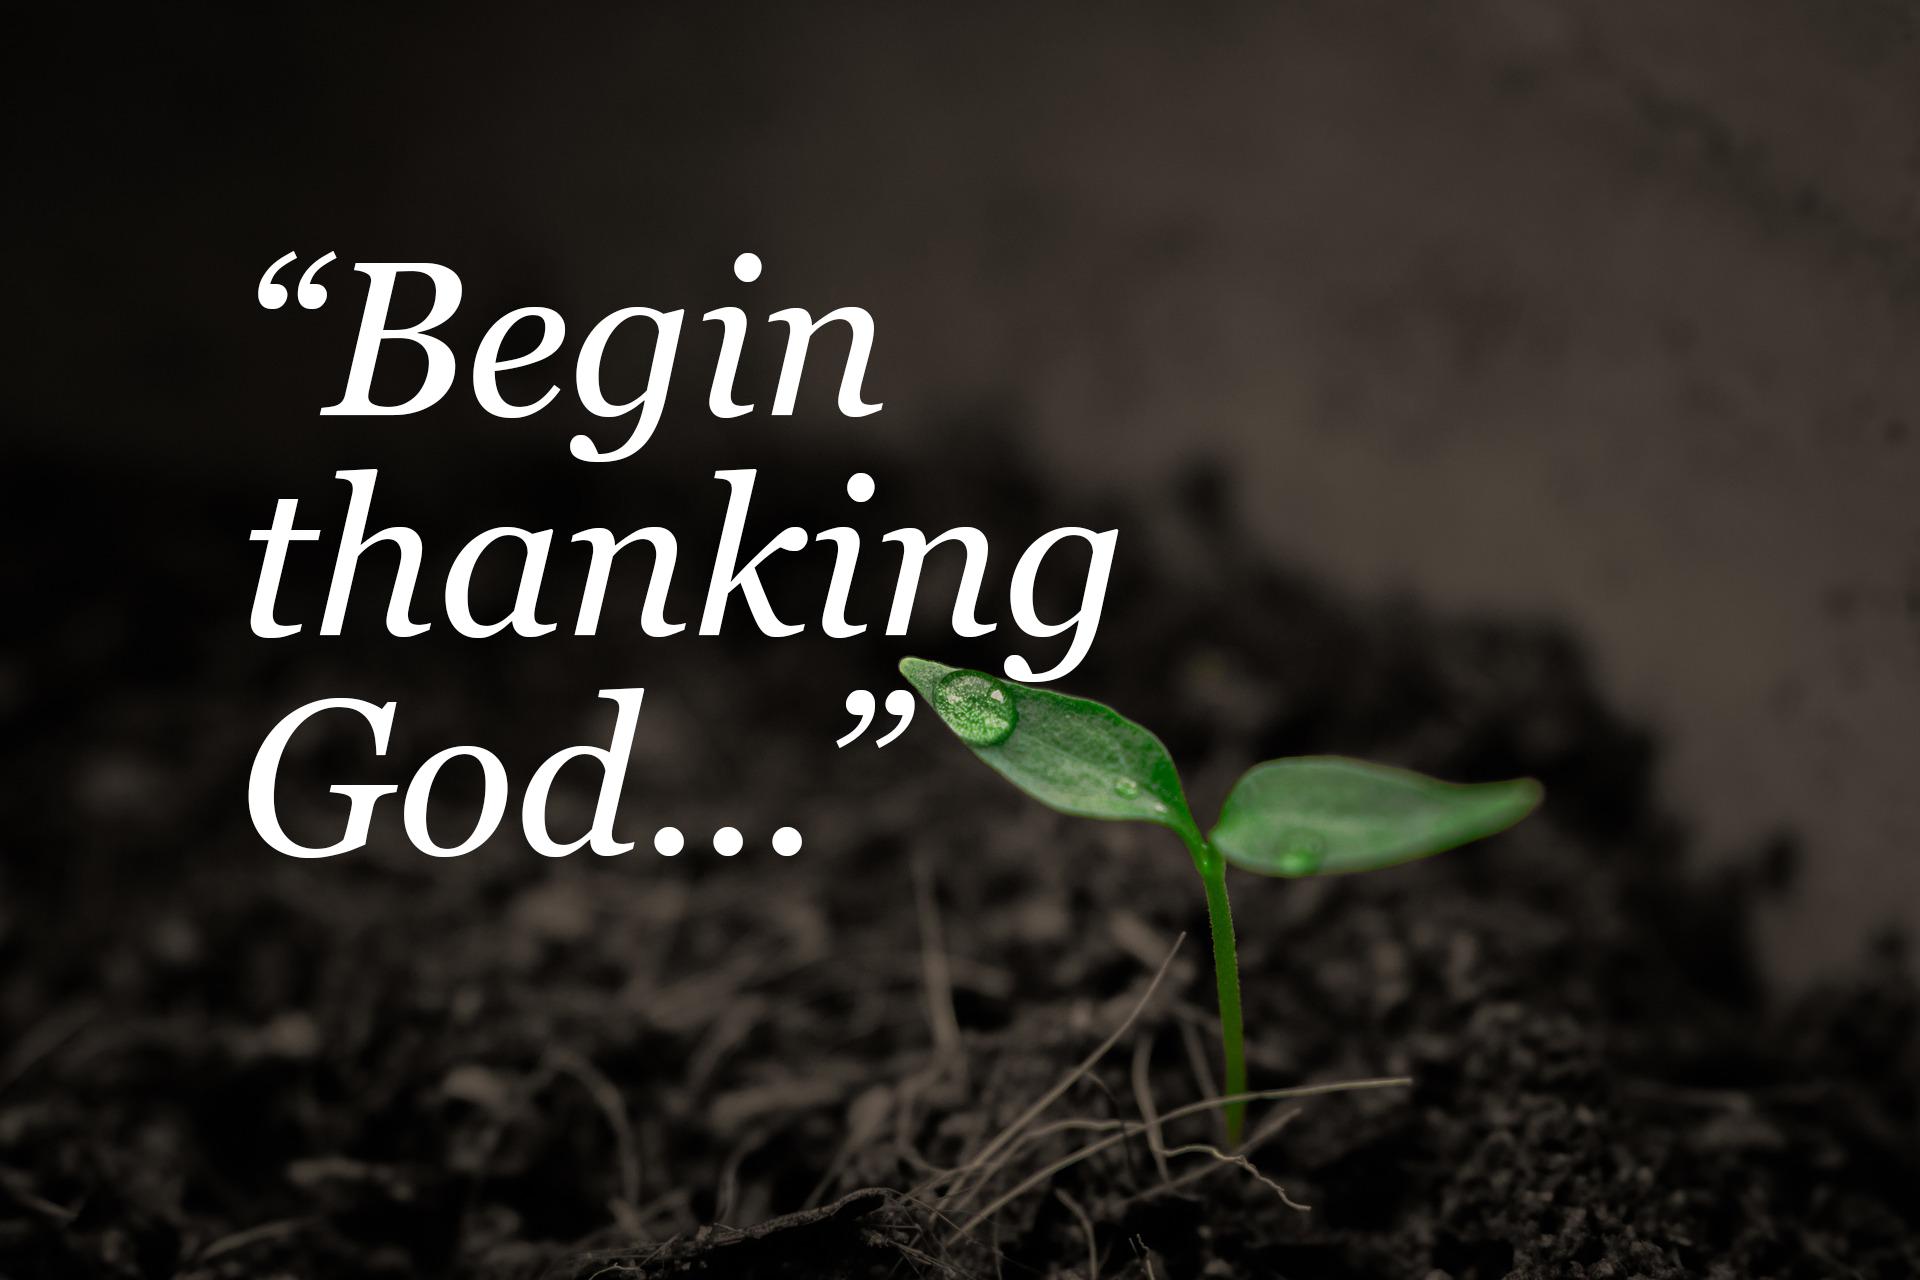 begin-thanking-god